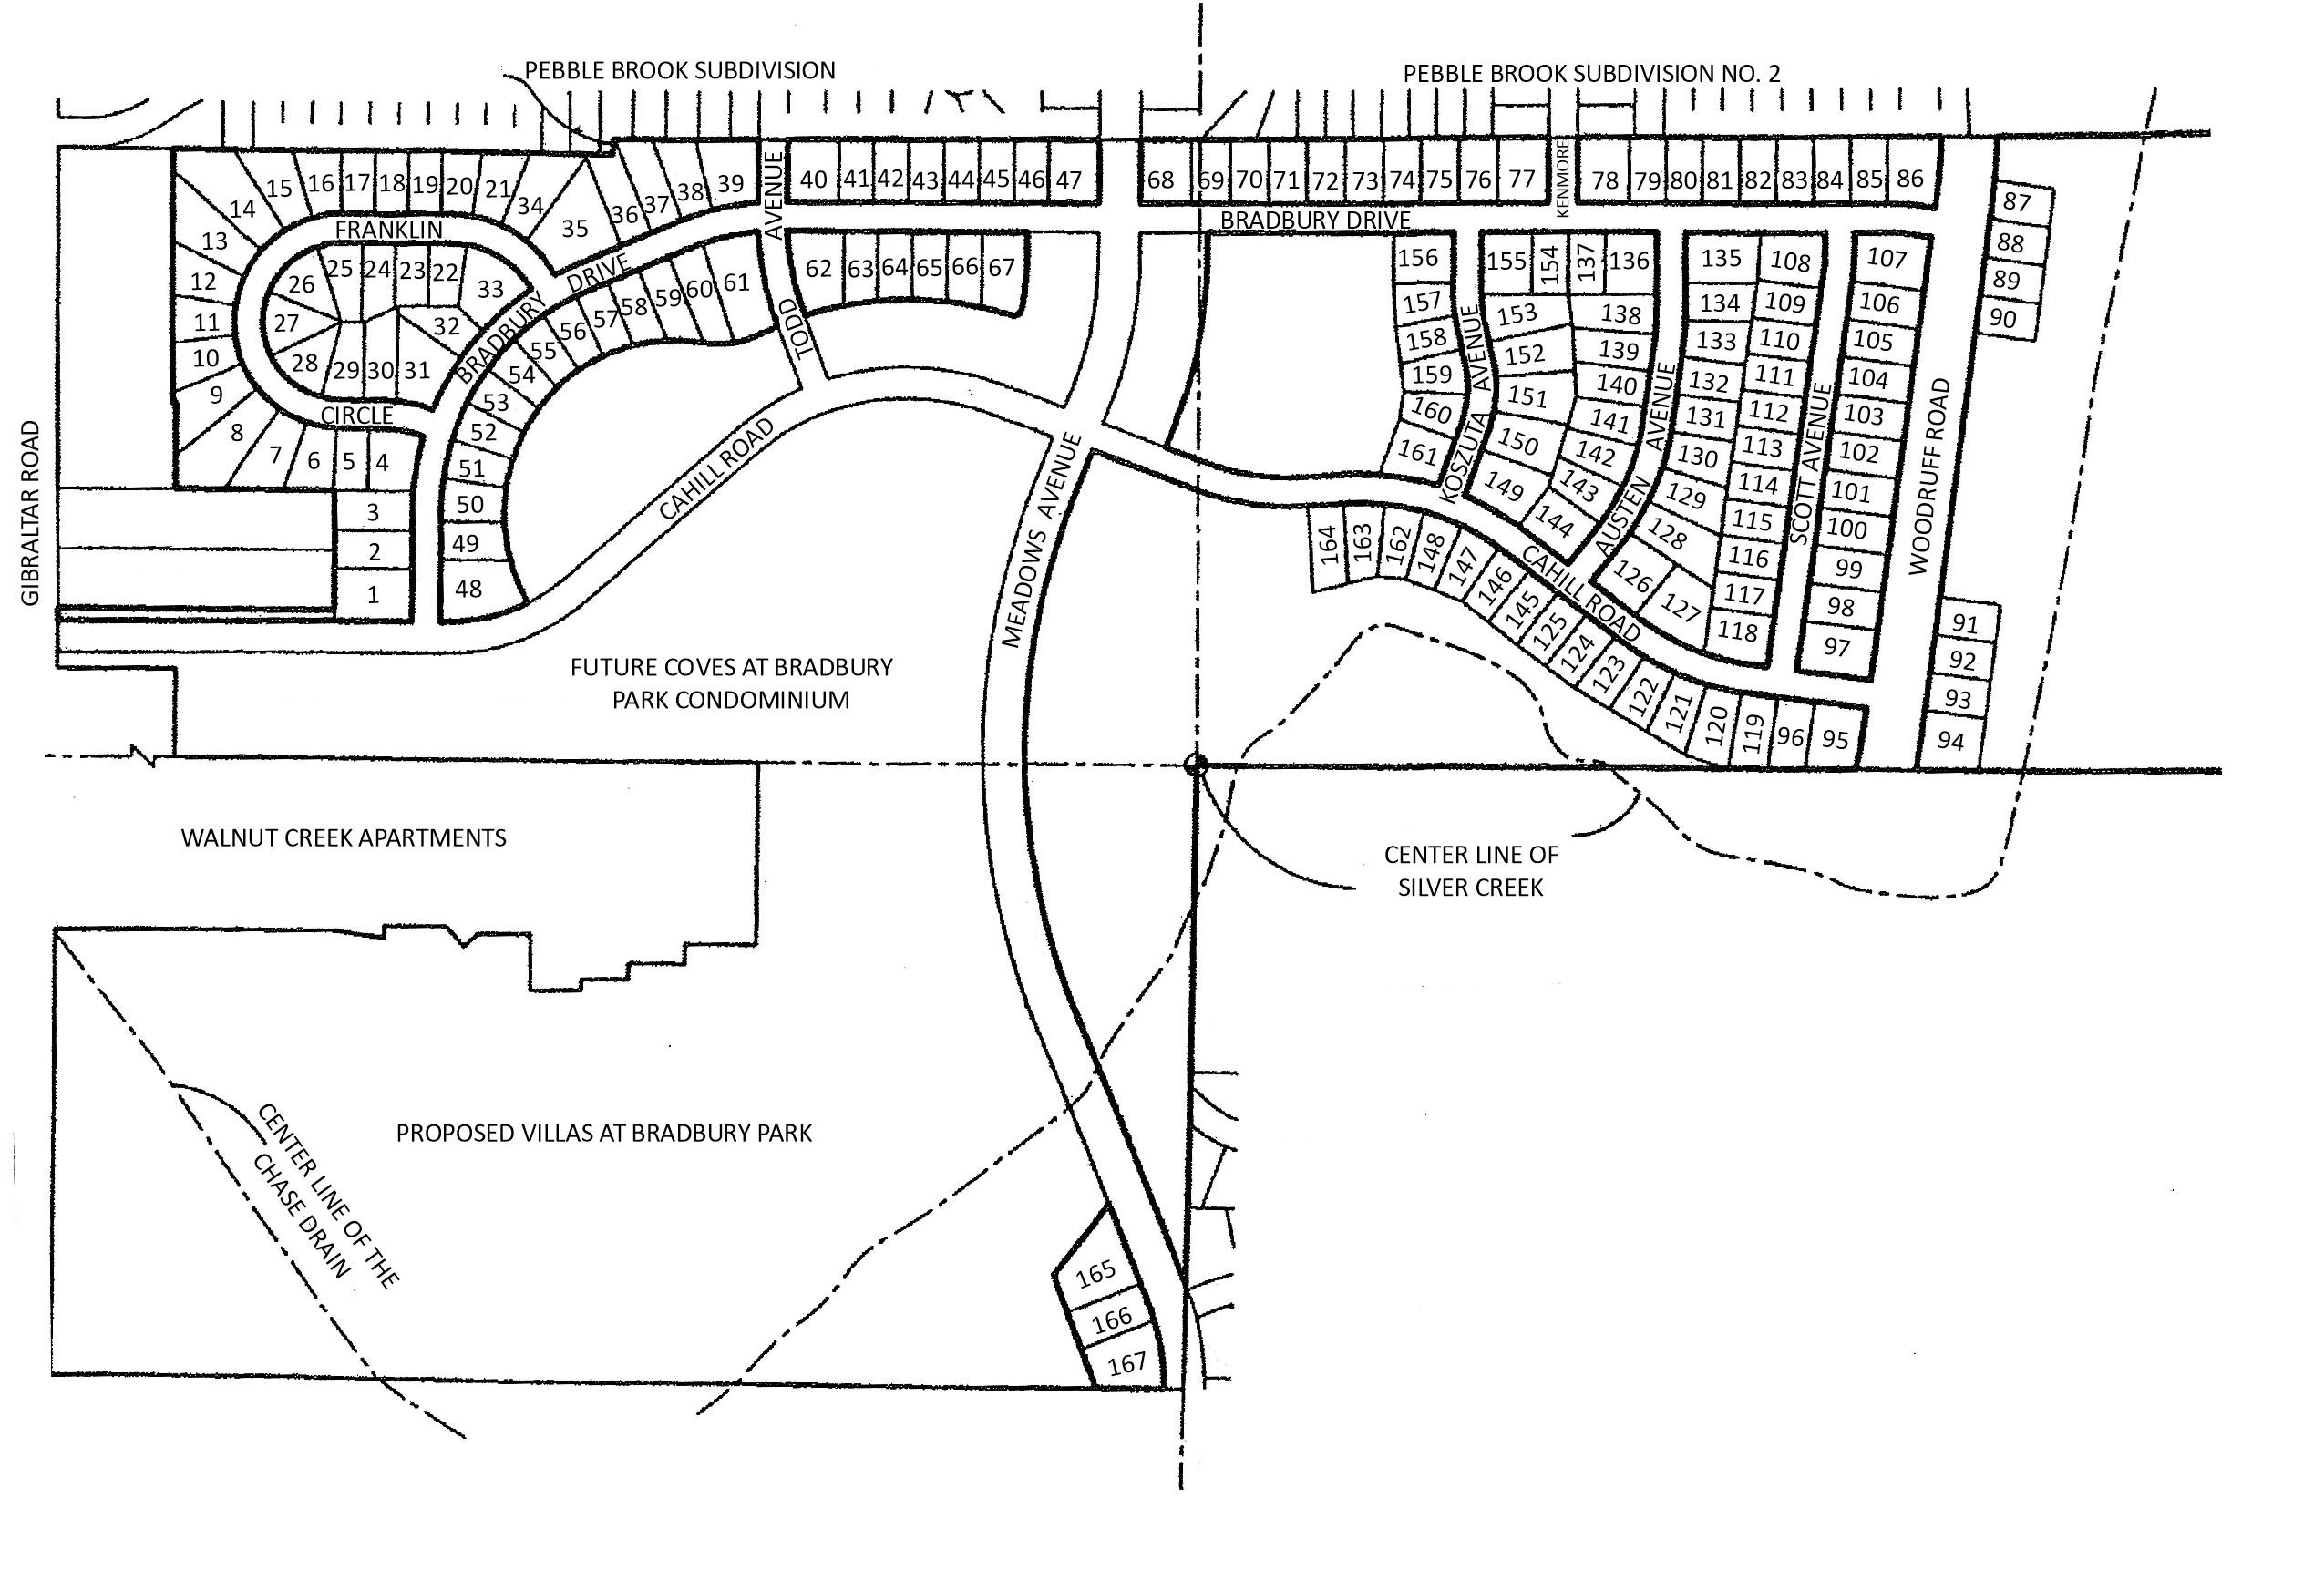 Preserves at Bradbury Park Site Plan Flat Rock Michigan 48134